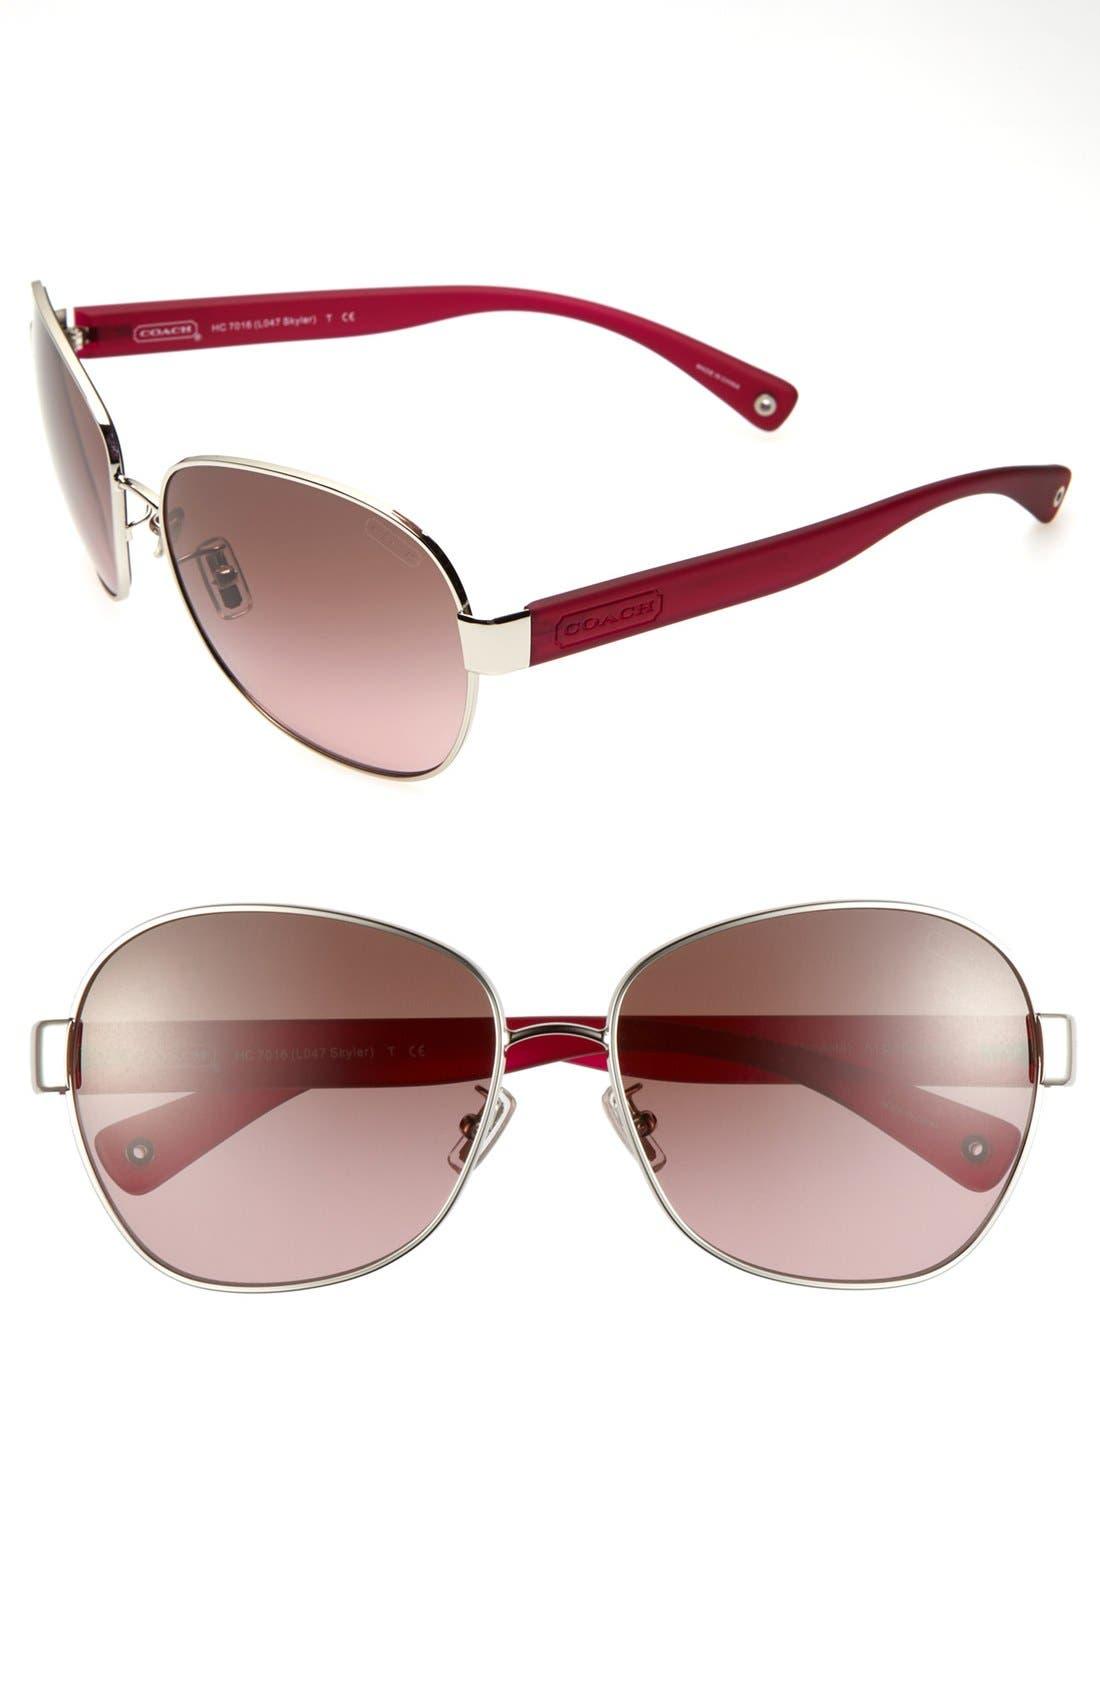 Alternate Image 1 Selected - COACH 'Skyler' 61mm Sunglasses